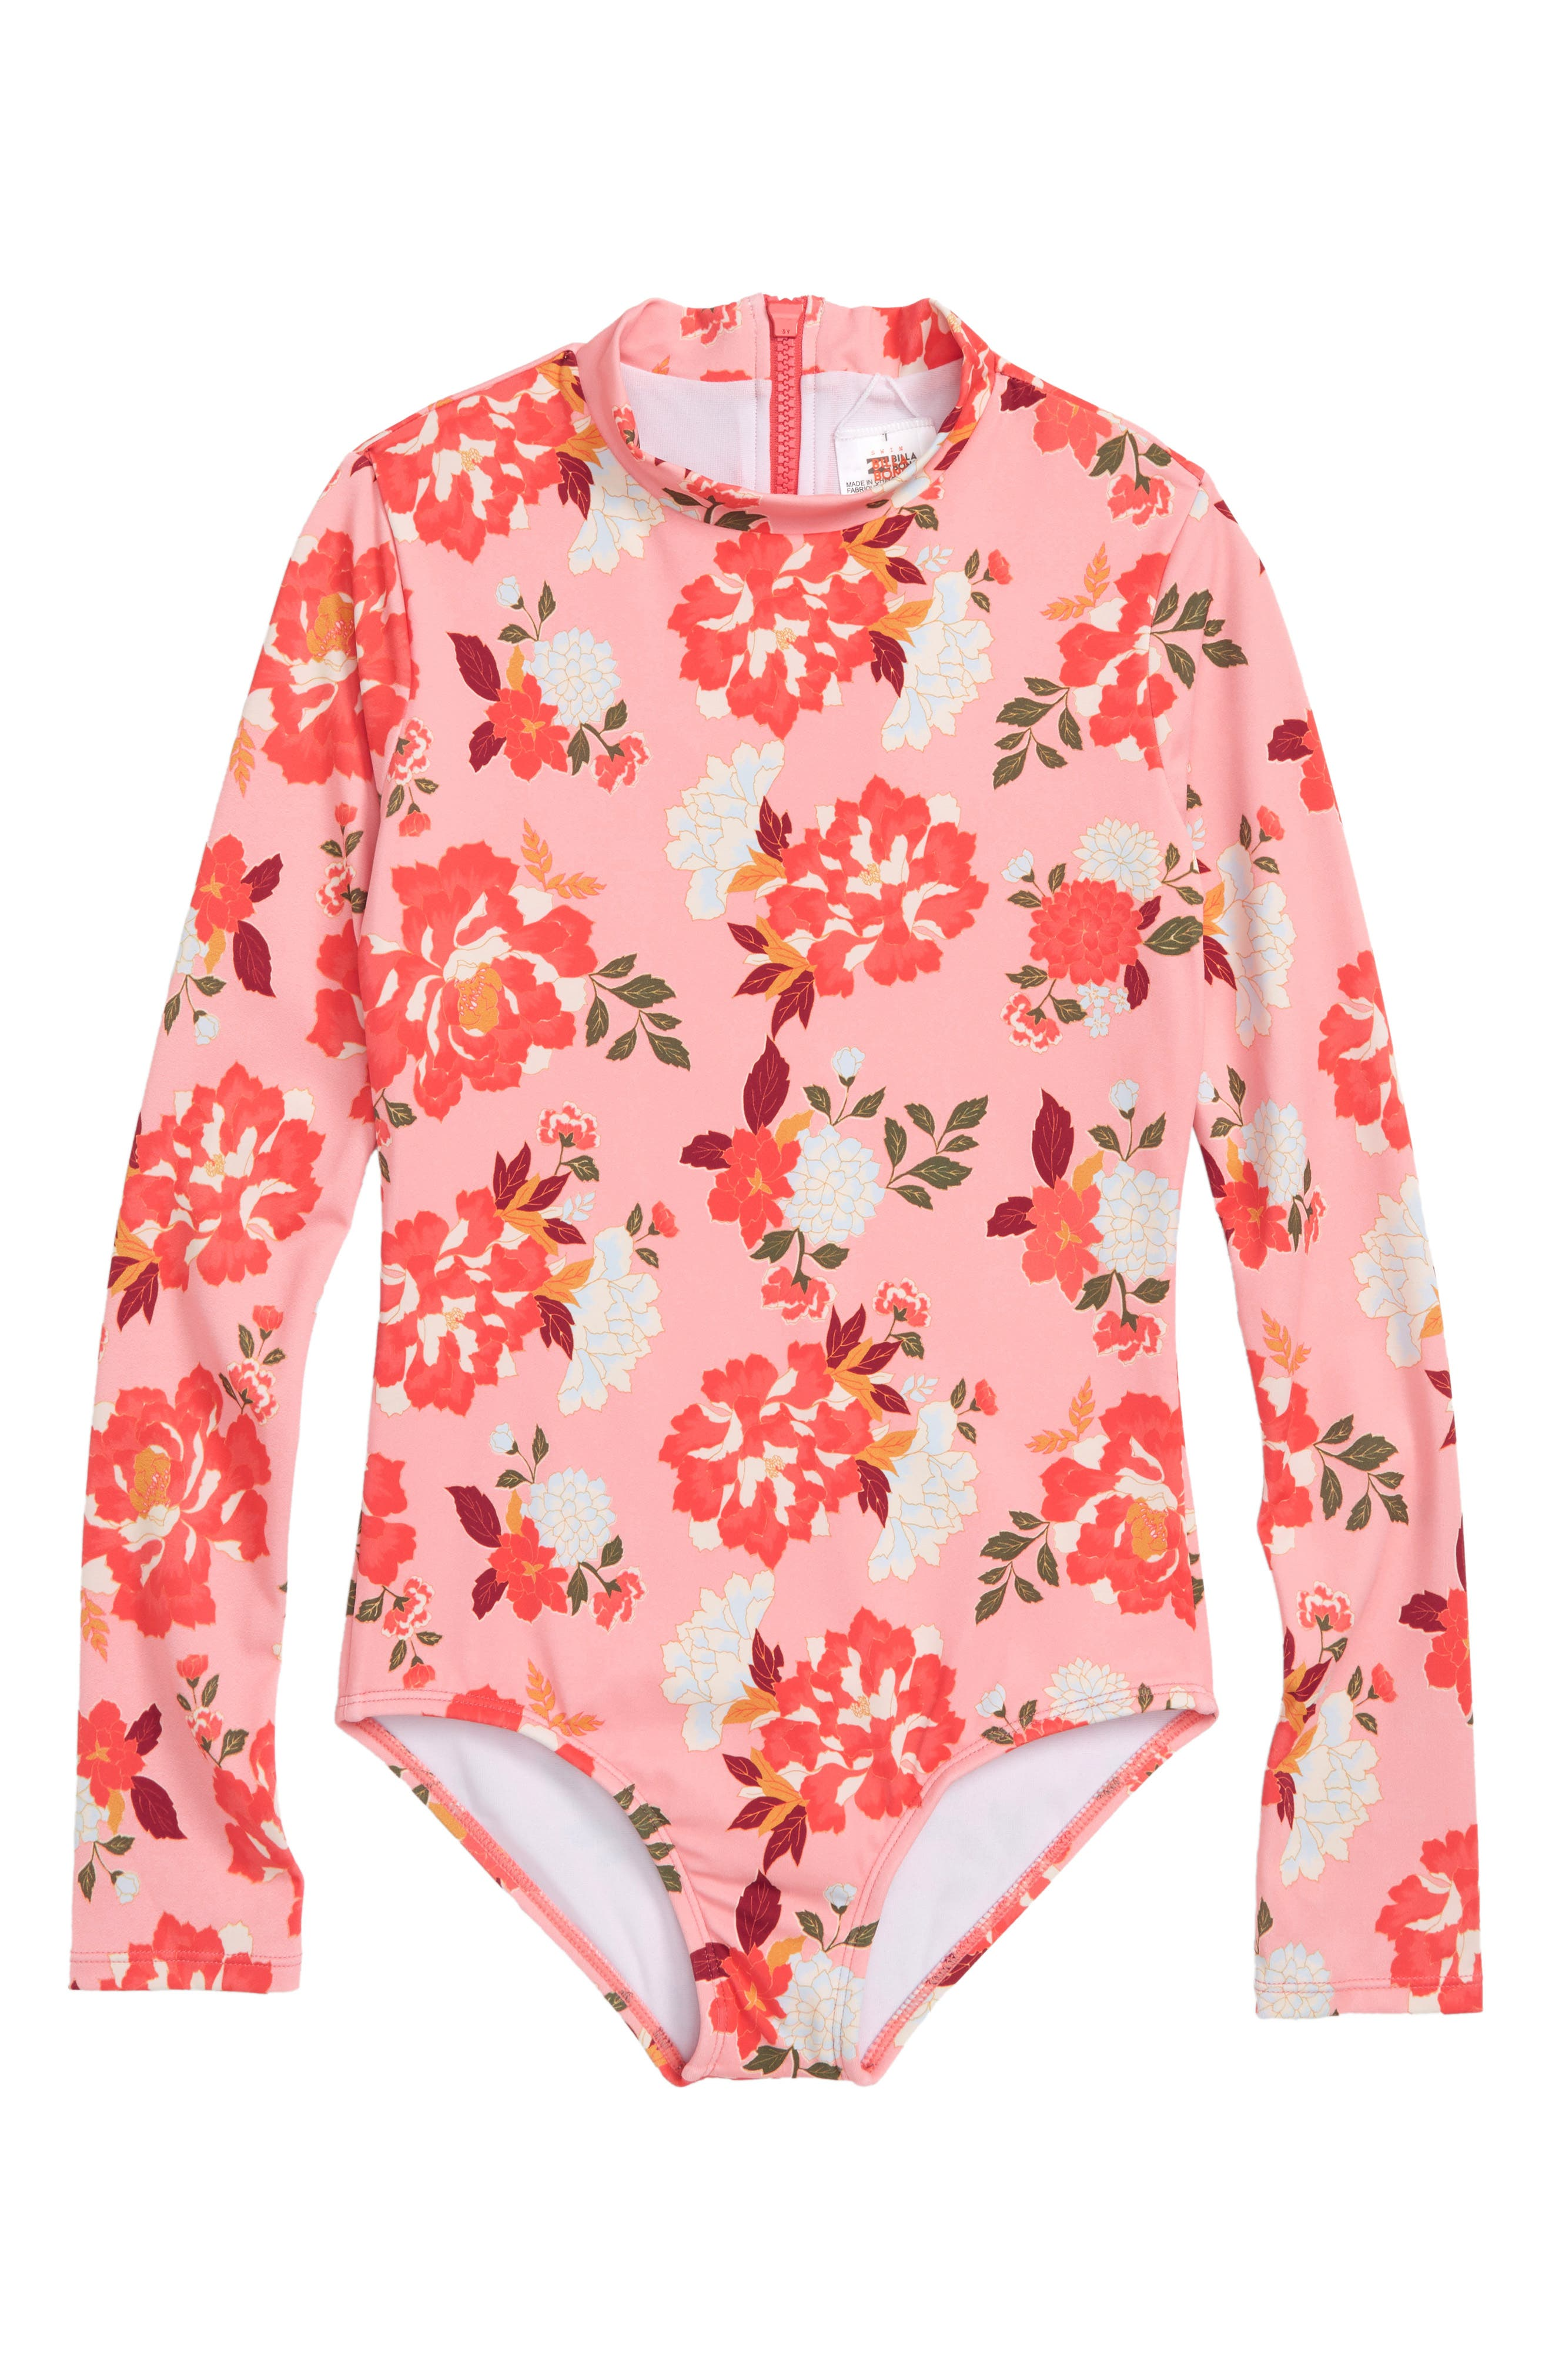 All Along One-Piece Rashguard Swimsuit,                         Main,                         color, 660